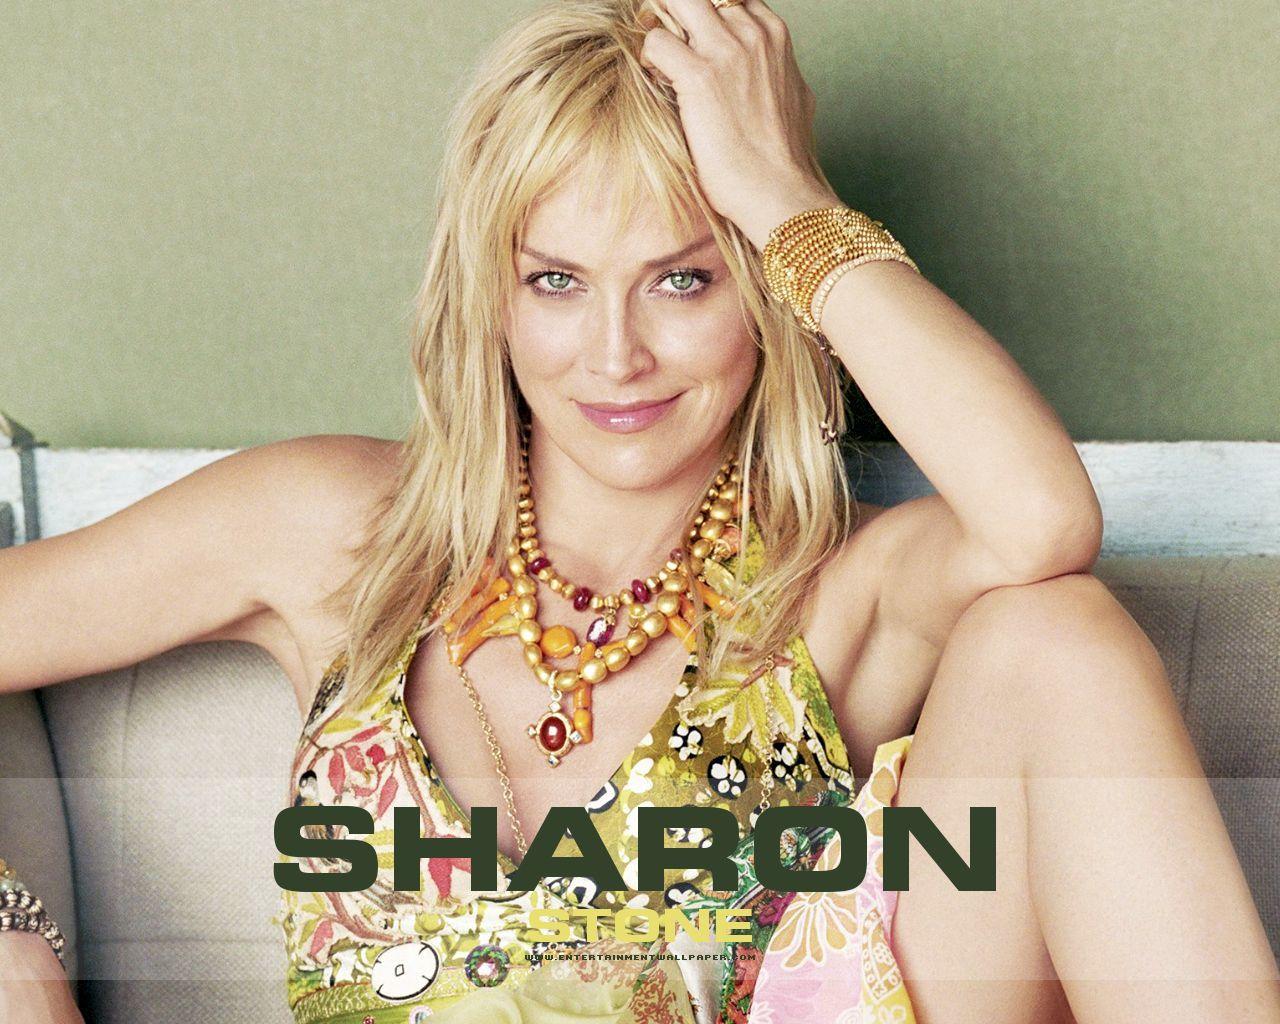 http://1.bp.blogspot.com/-1dOq6cIbsGc/UJksD4GVrFI/AAAAAAAAezk/BUFaDSi4VRM/s1600/sharon-stone-sexy.jpg